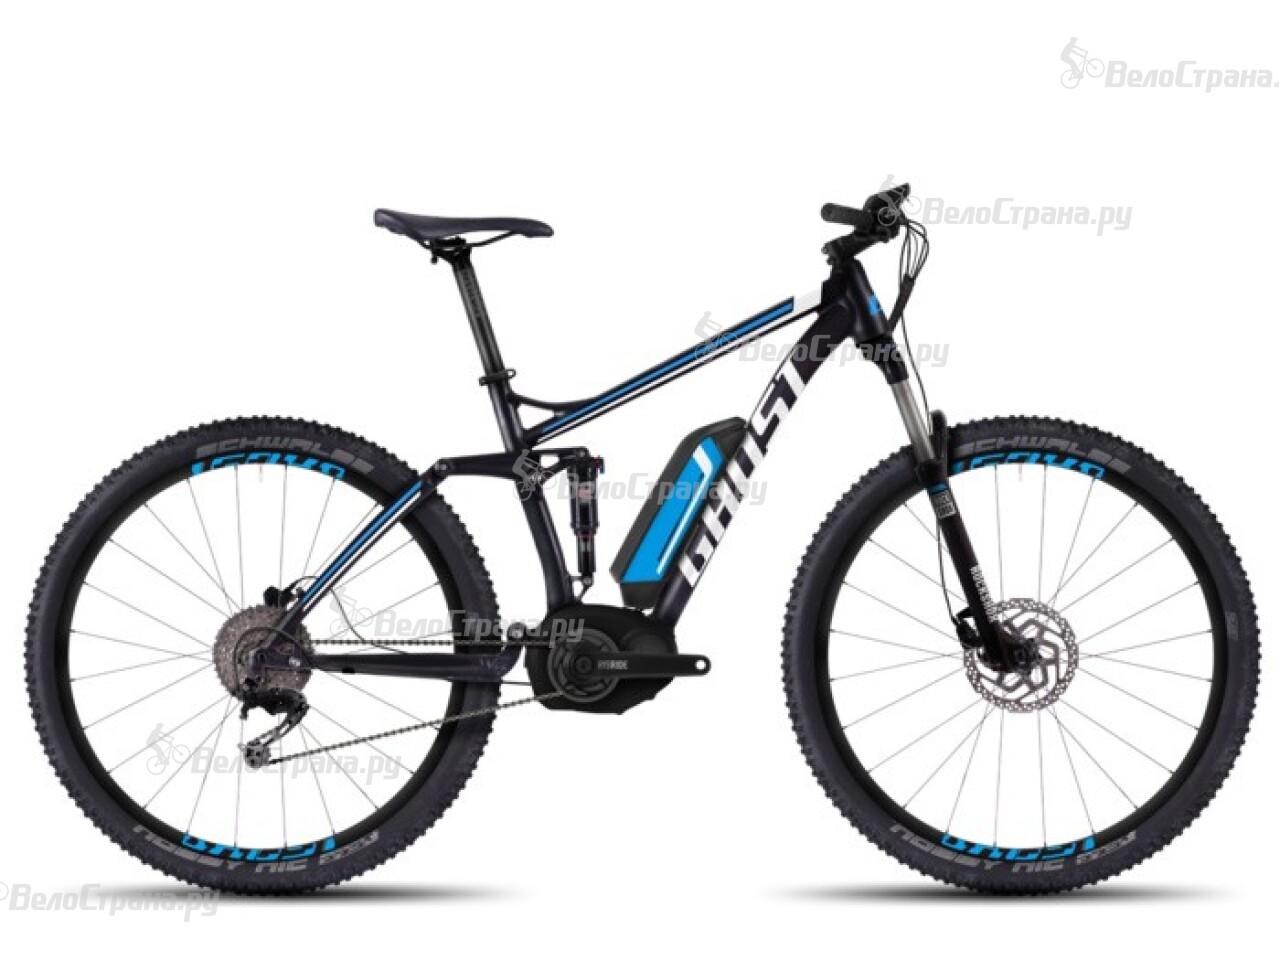 Велосипед Ghost Teru FS 5 (2016) велосипед challenger mission lux fs 26 черно красный 16